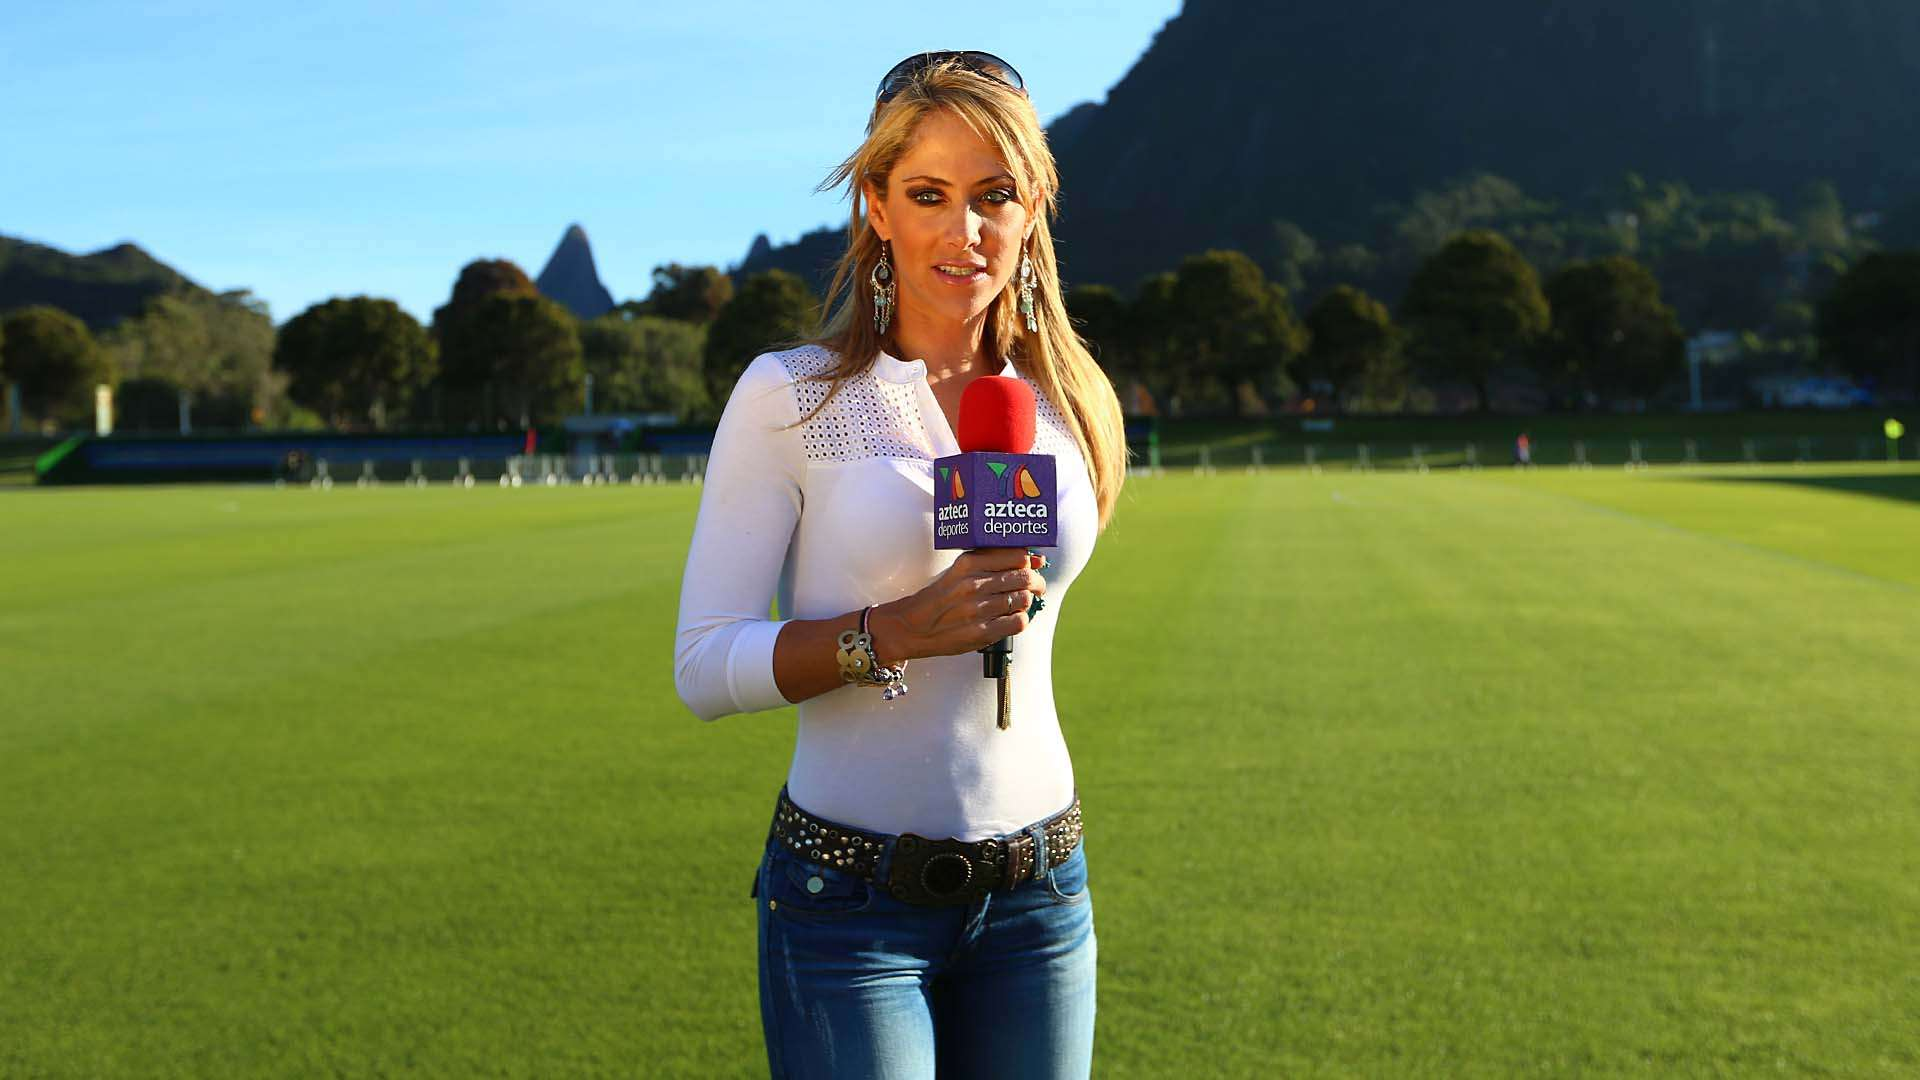 Sportreporter Namen